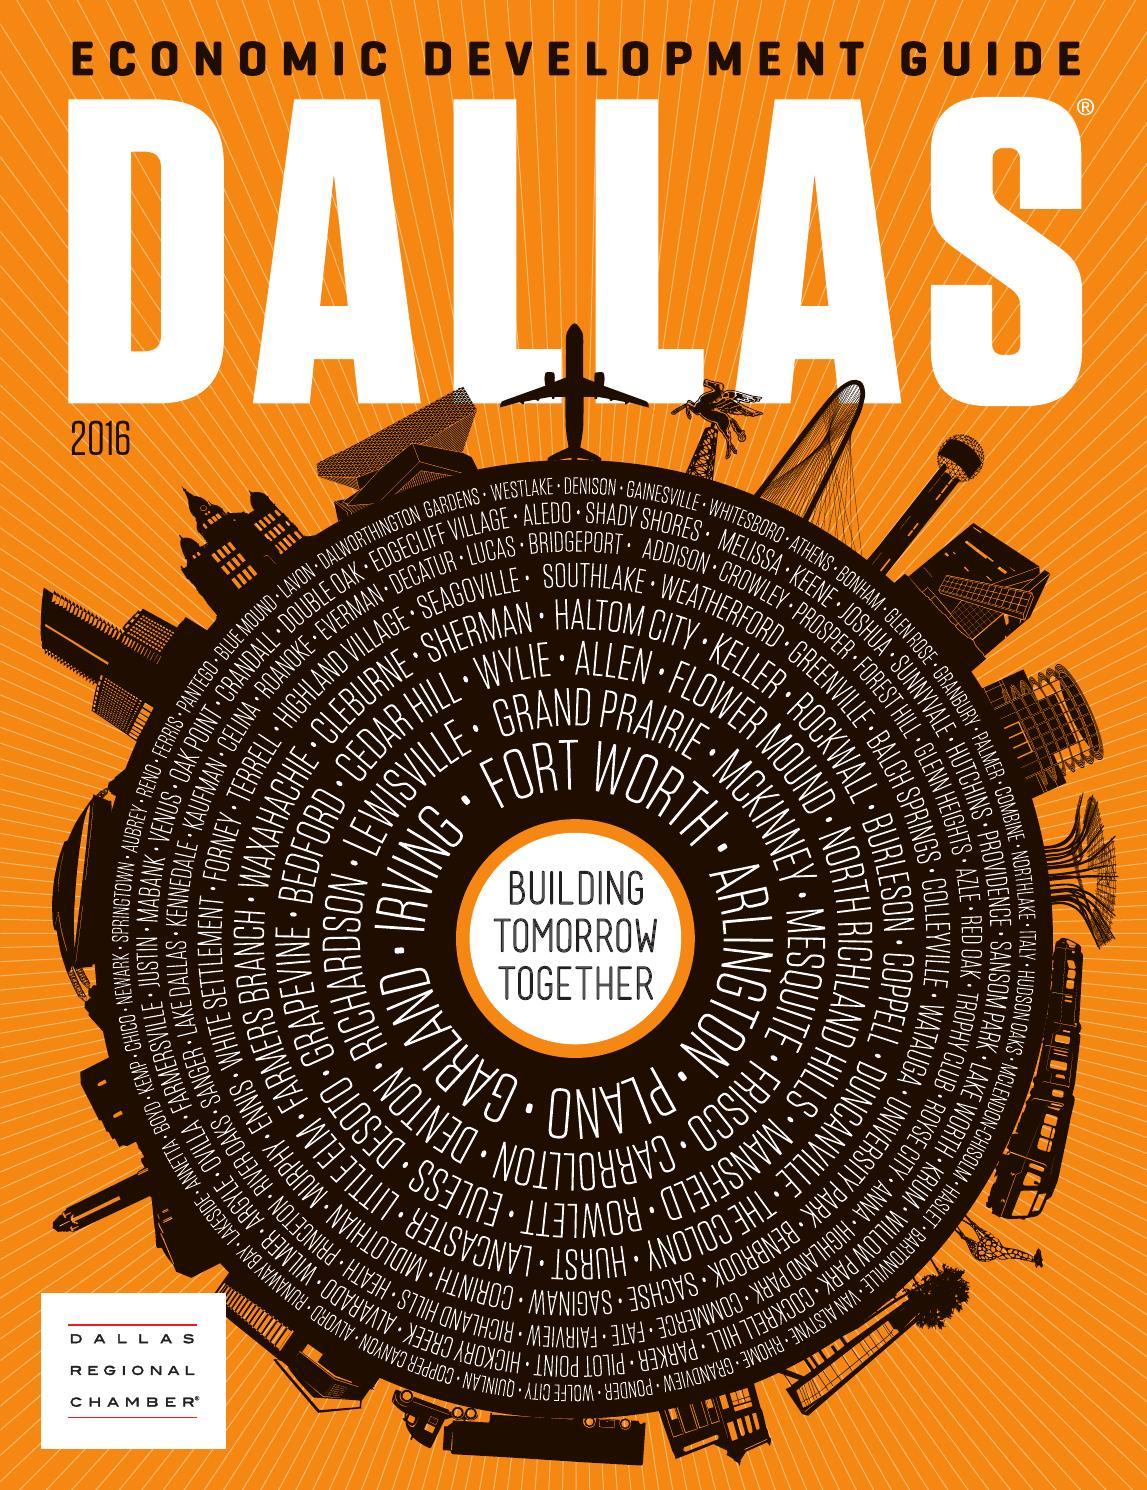 Dallas Economic Development Guide - 2016 by Dallas Regional Chamber  Publications - issuu 56d3b1a4ec